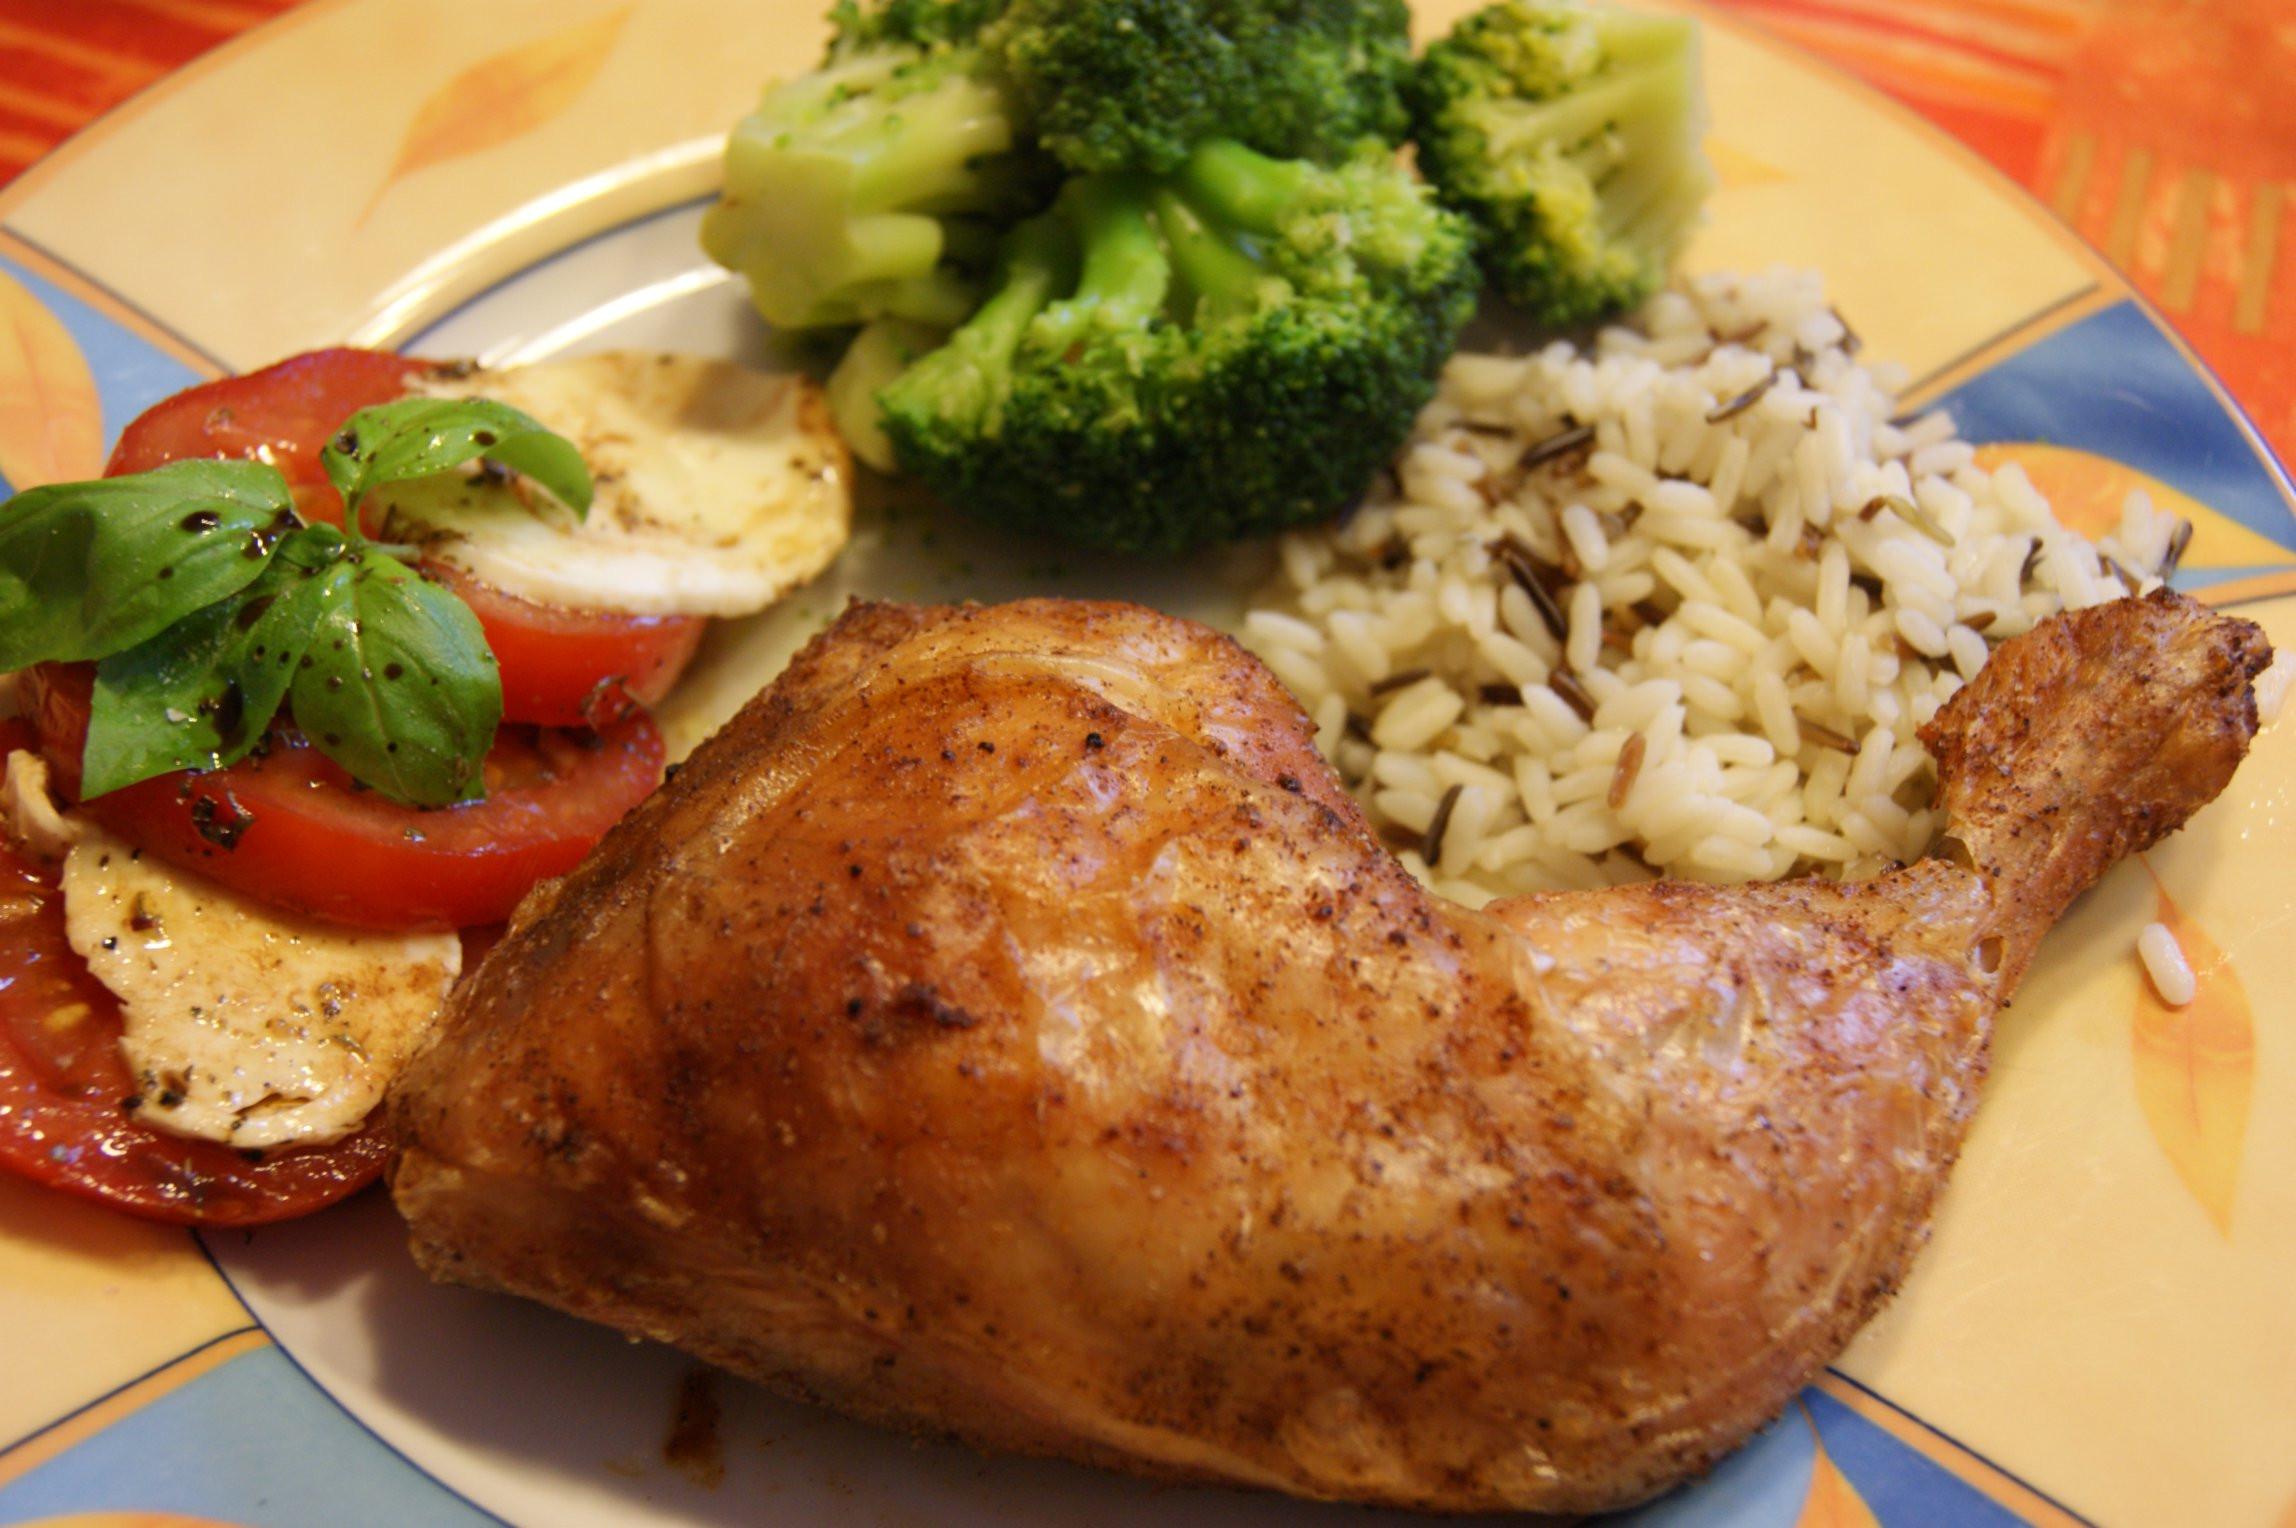 Roast Chicken Legs  Roasted Chicken Legs – ginger lemon & spice